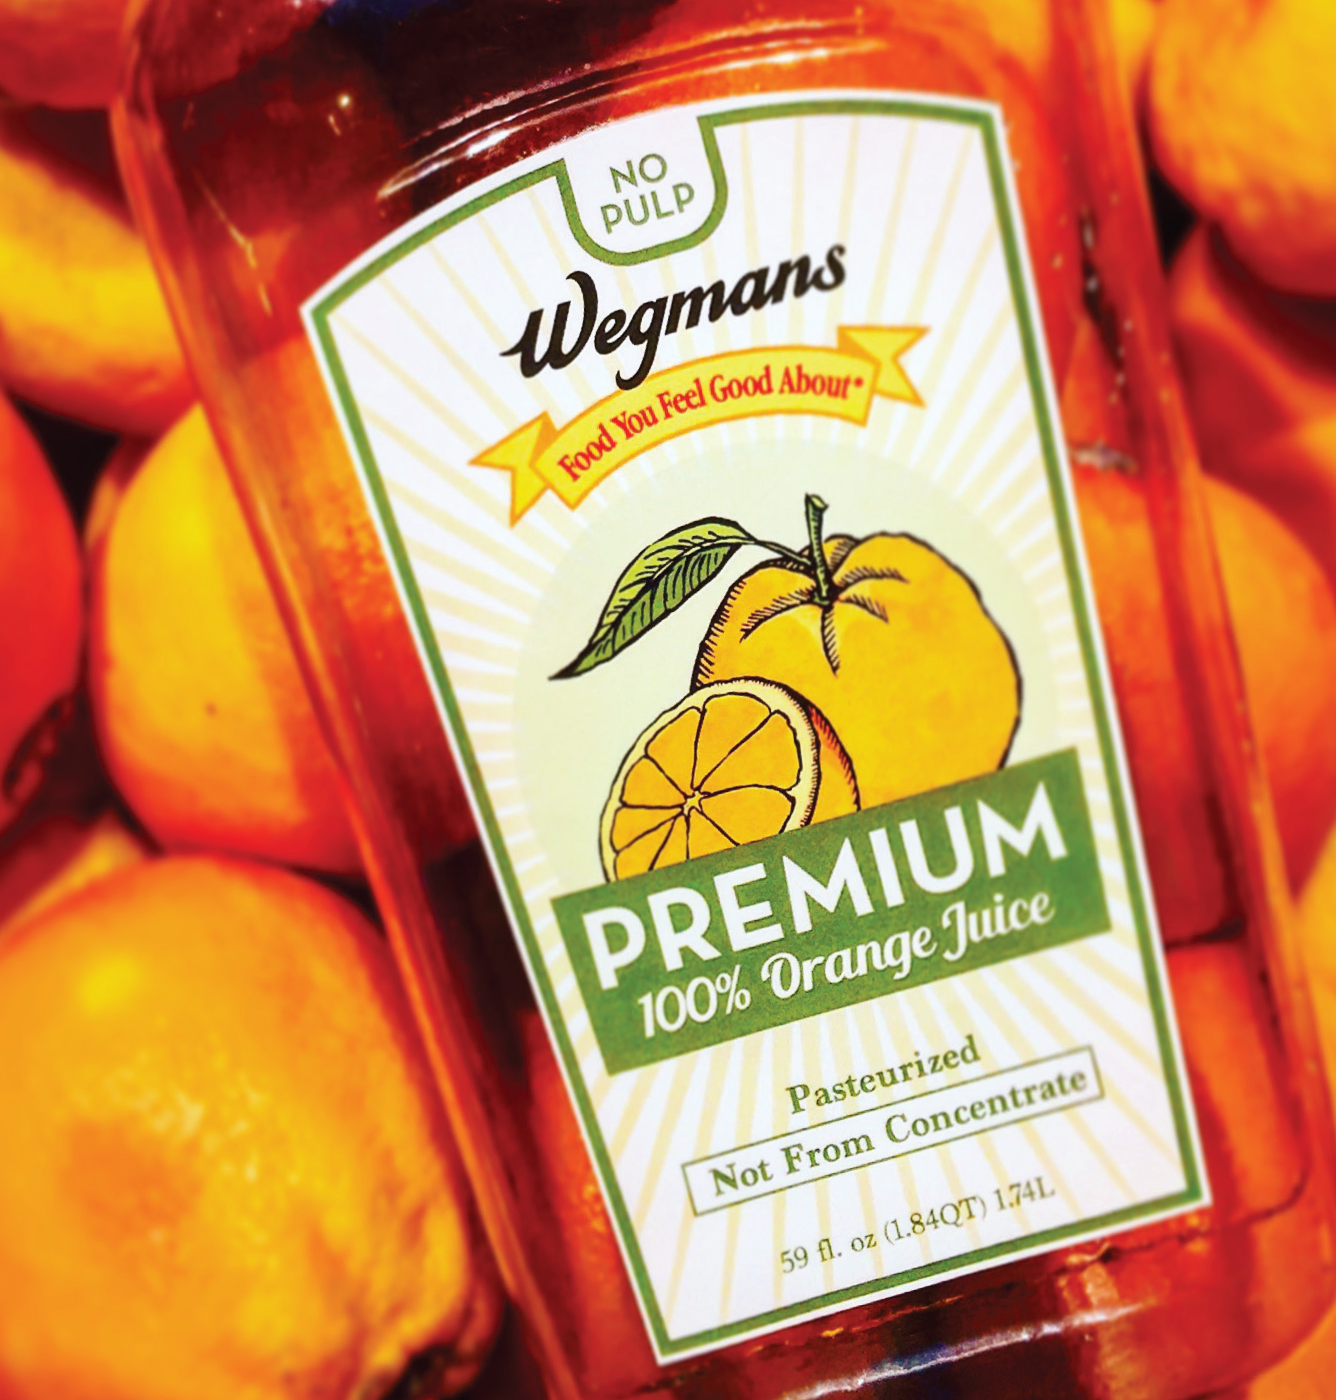 Wegman's Orange juice